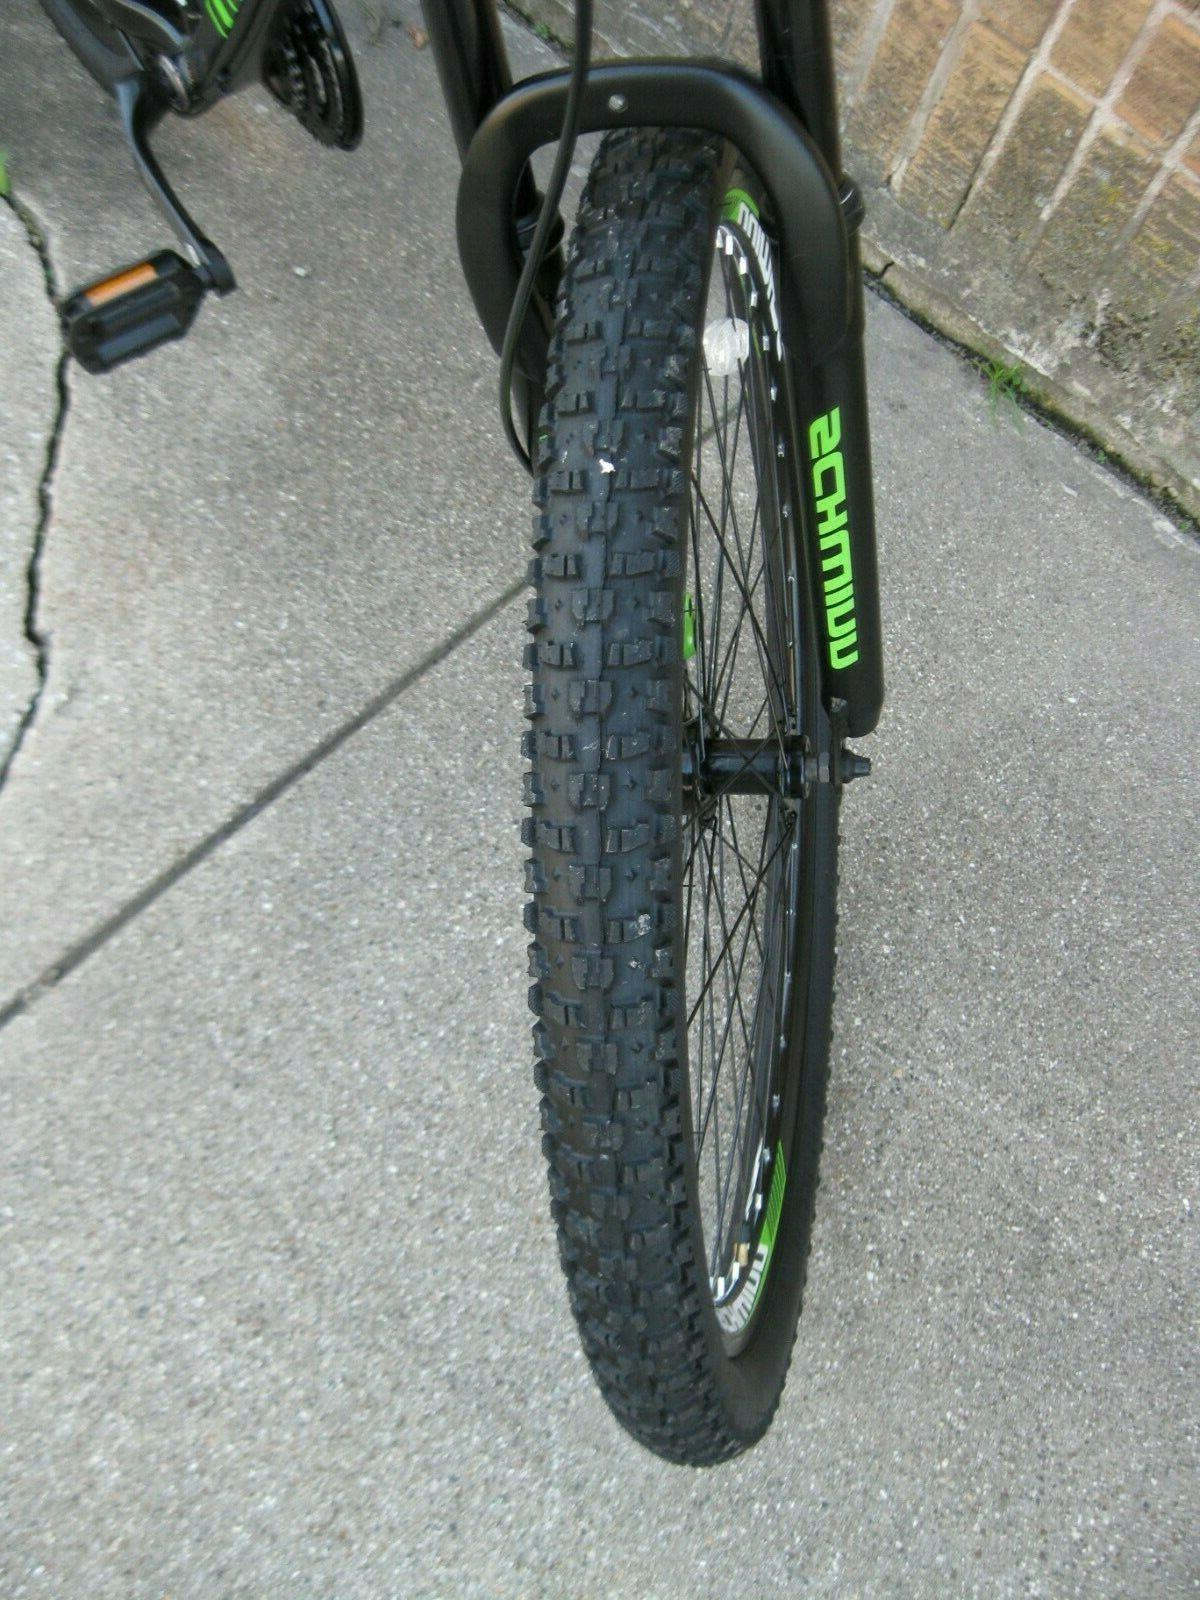 Schwinn Boundary 29 21 Shimano Aluminum Frame Bicycle. PICKUP